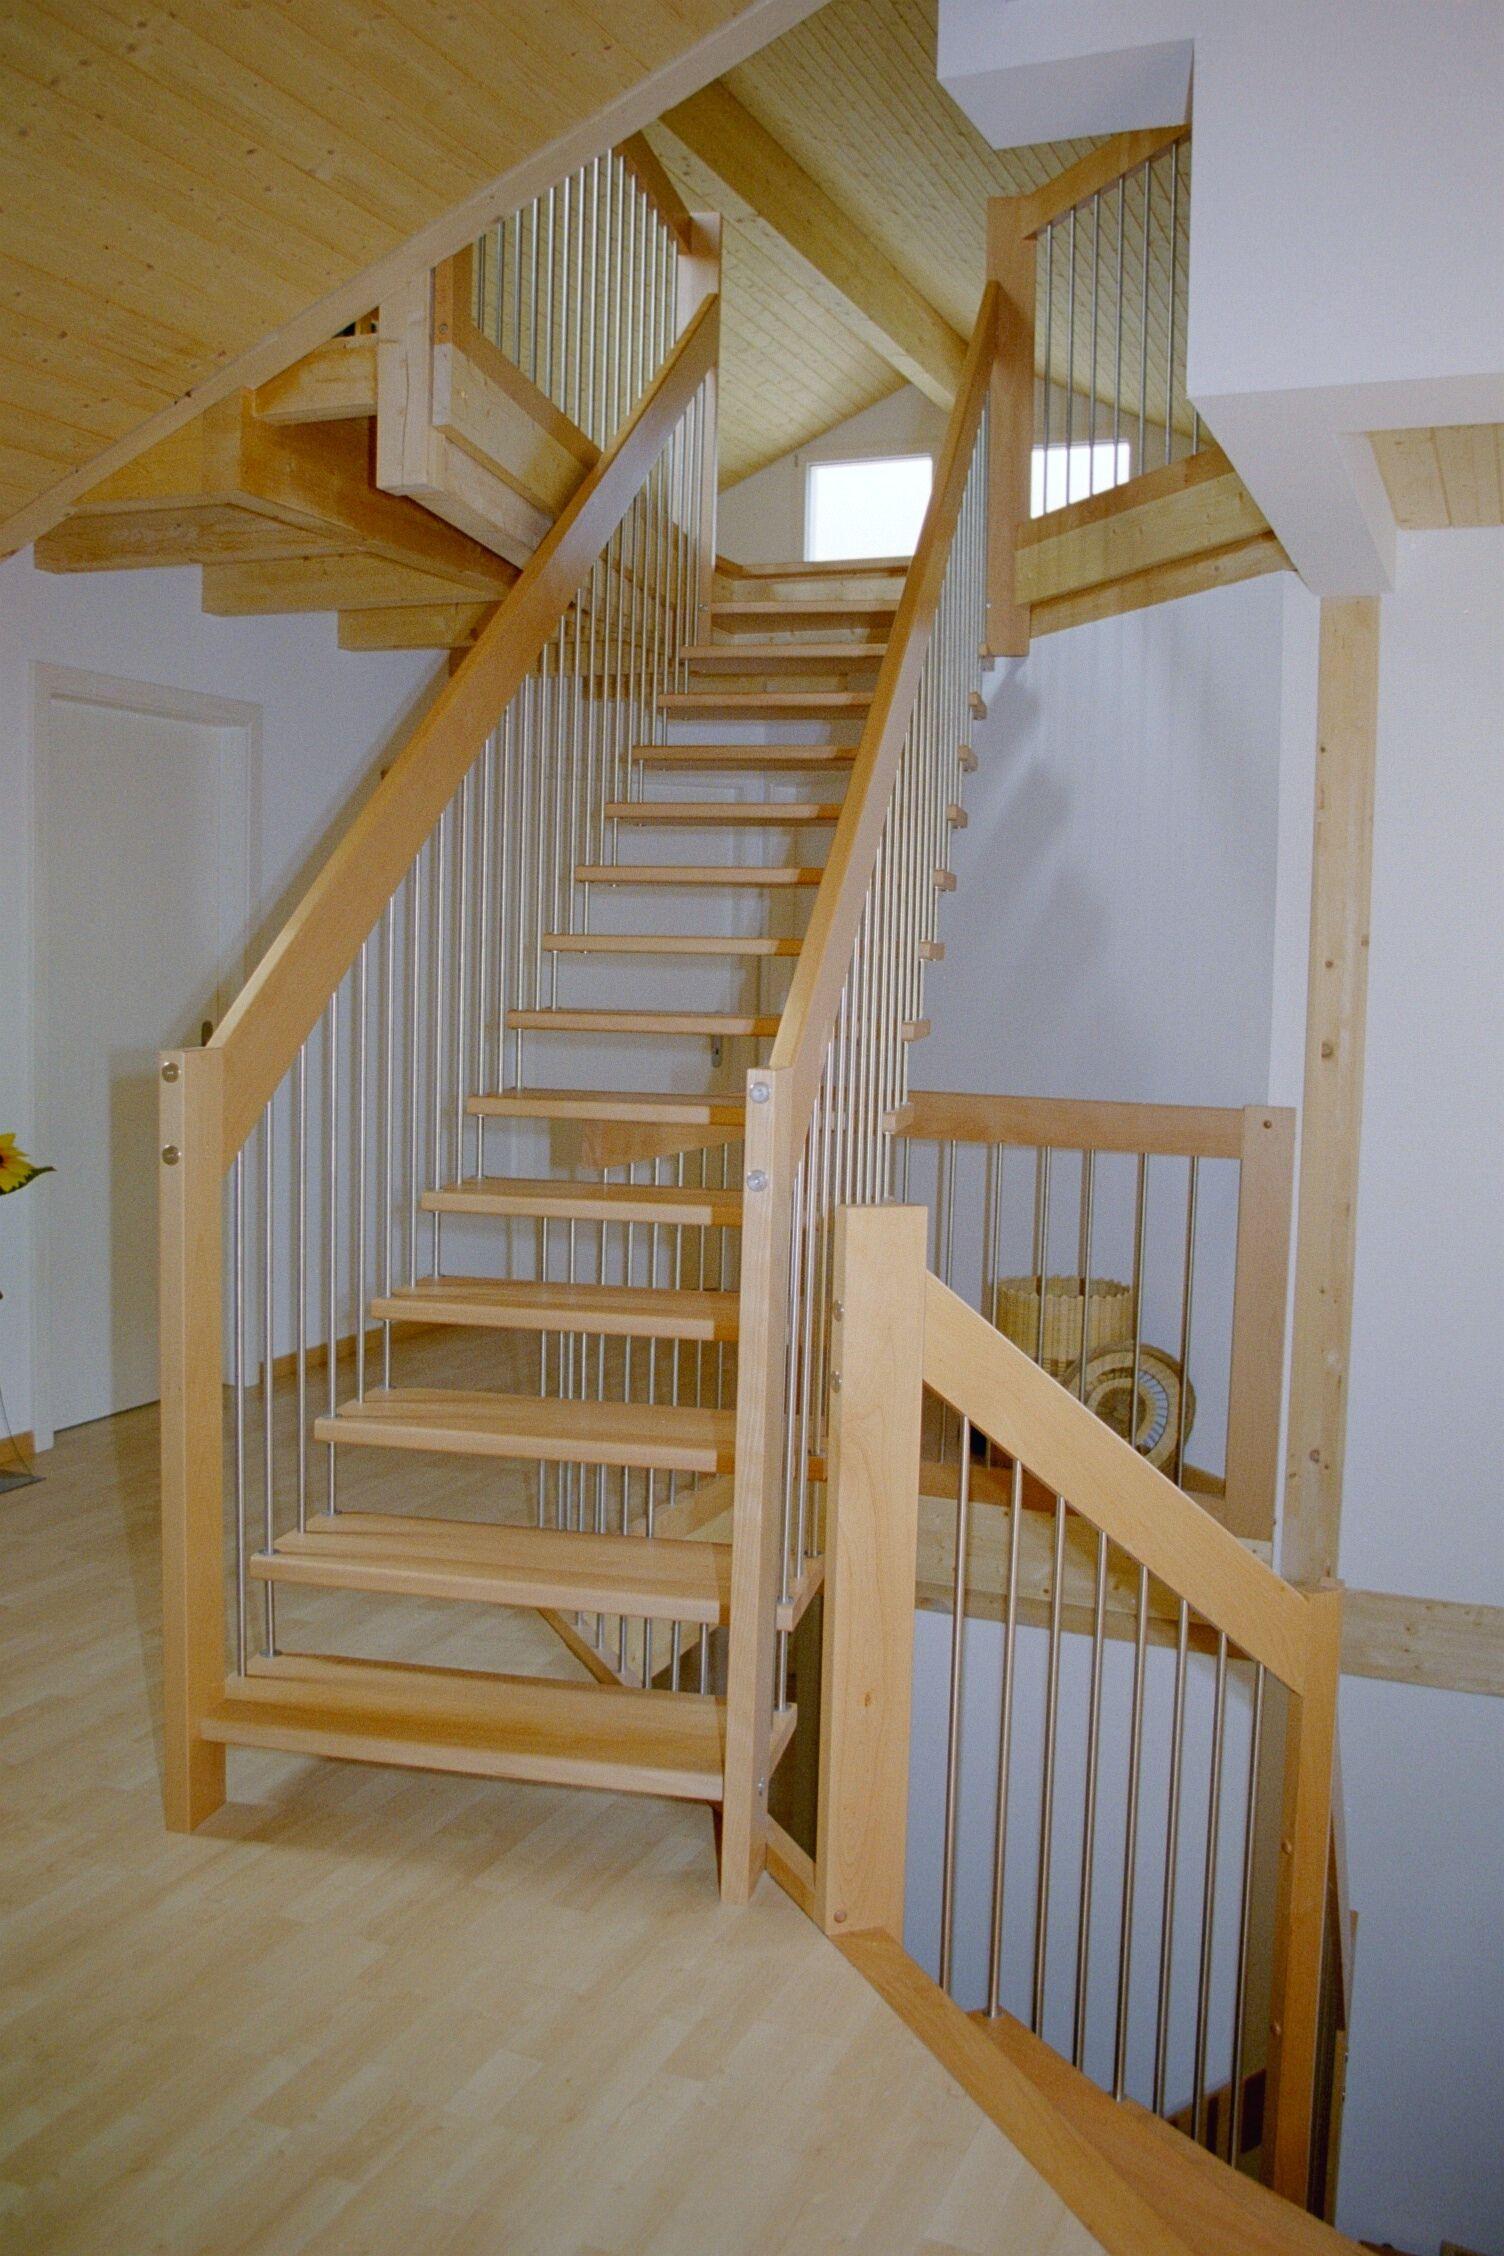 Stair Image 26